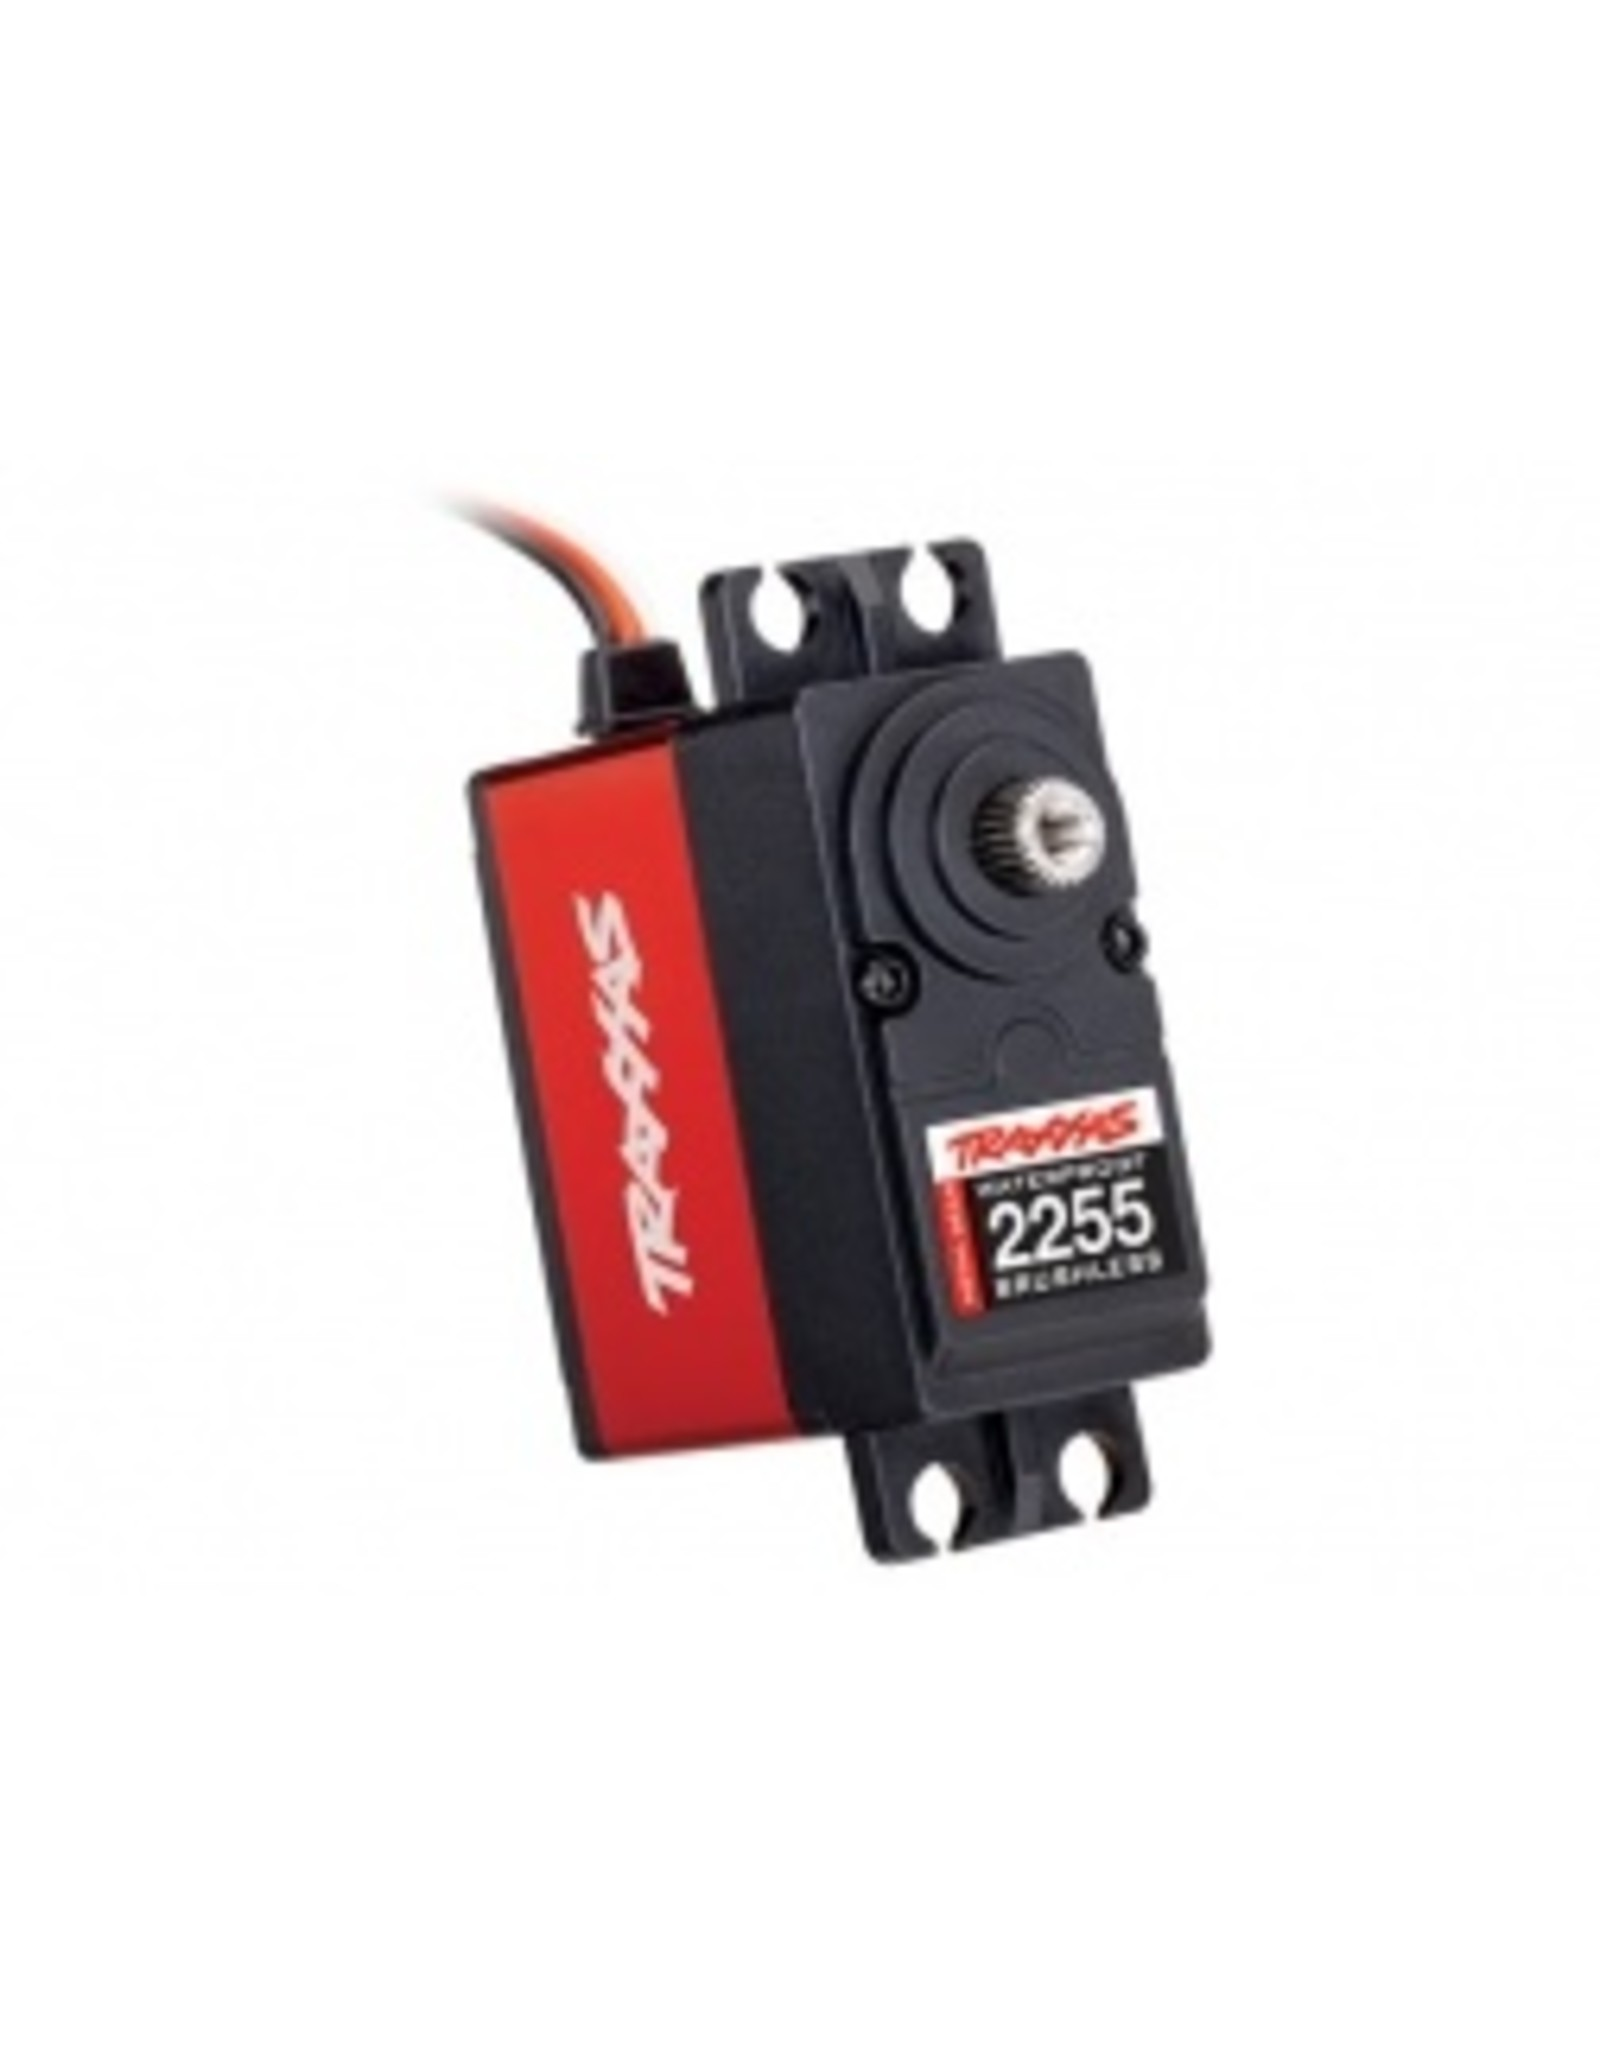 Traxxas Servo, digital high-torque 400 brushless, metal gear (ball bearing), waterproof (TRA2255)